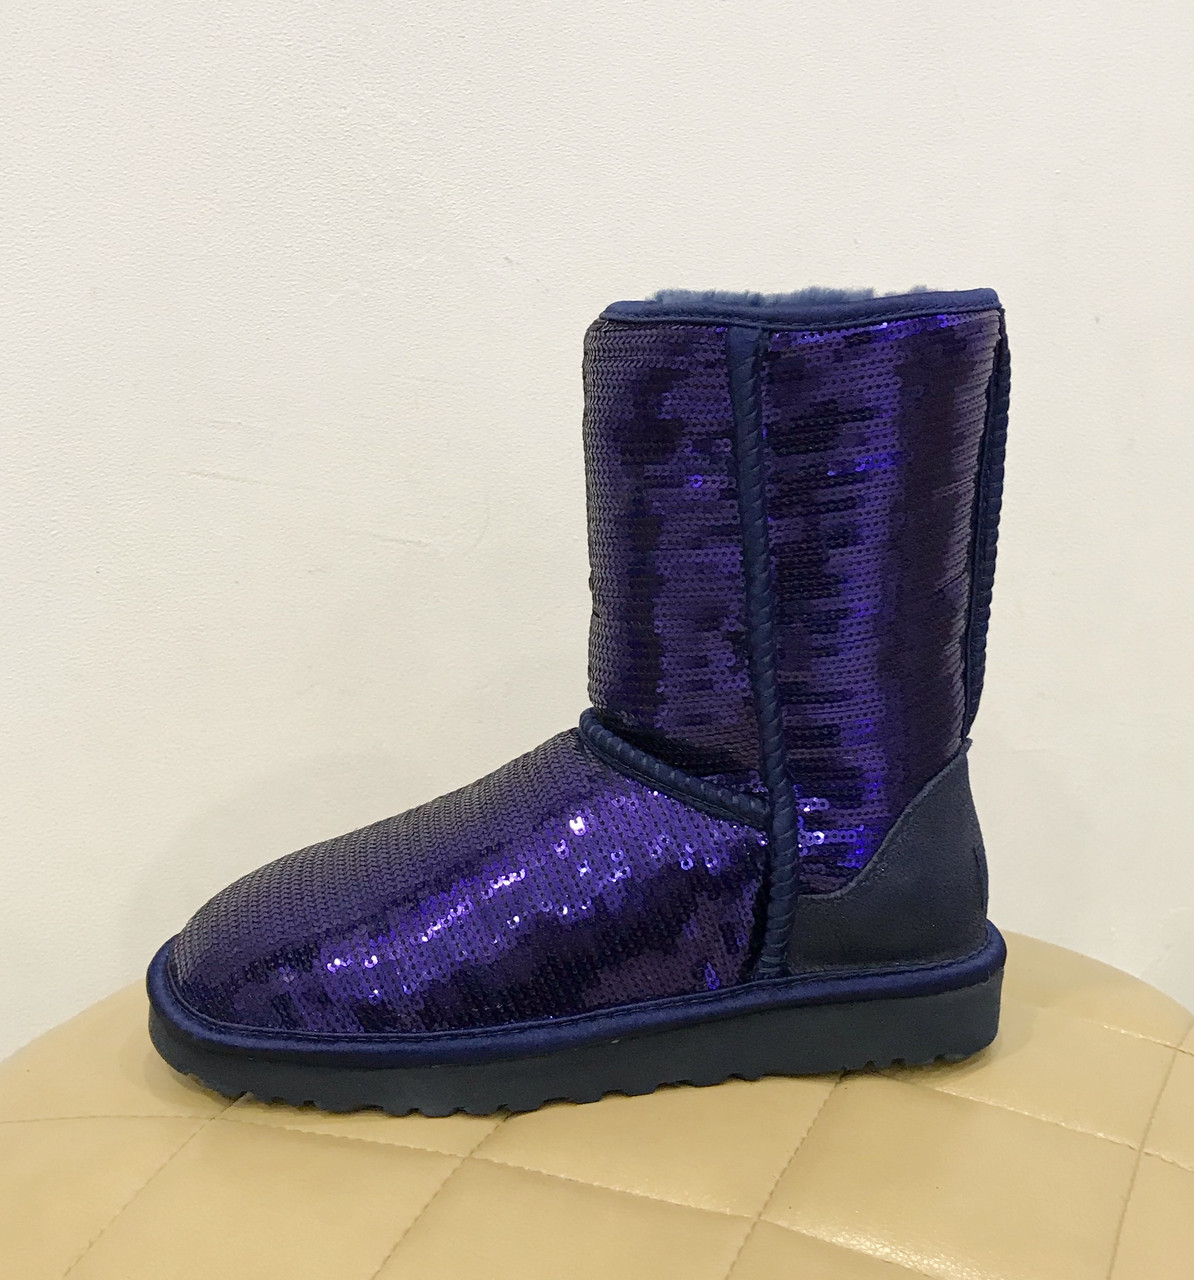 UGG Australia Classic Short Sparkles Purple Угги классические с пайетками фиолетовые